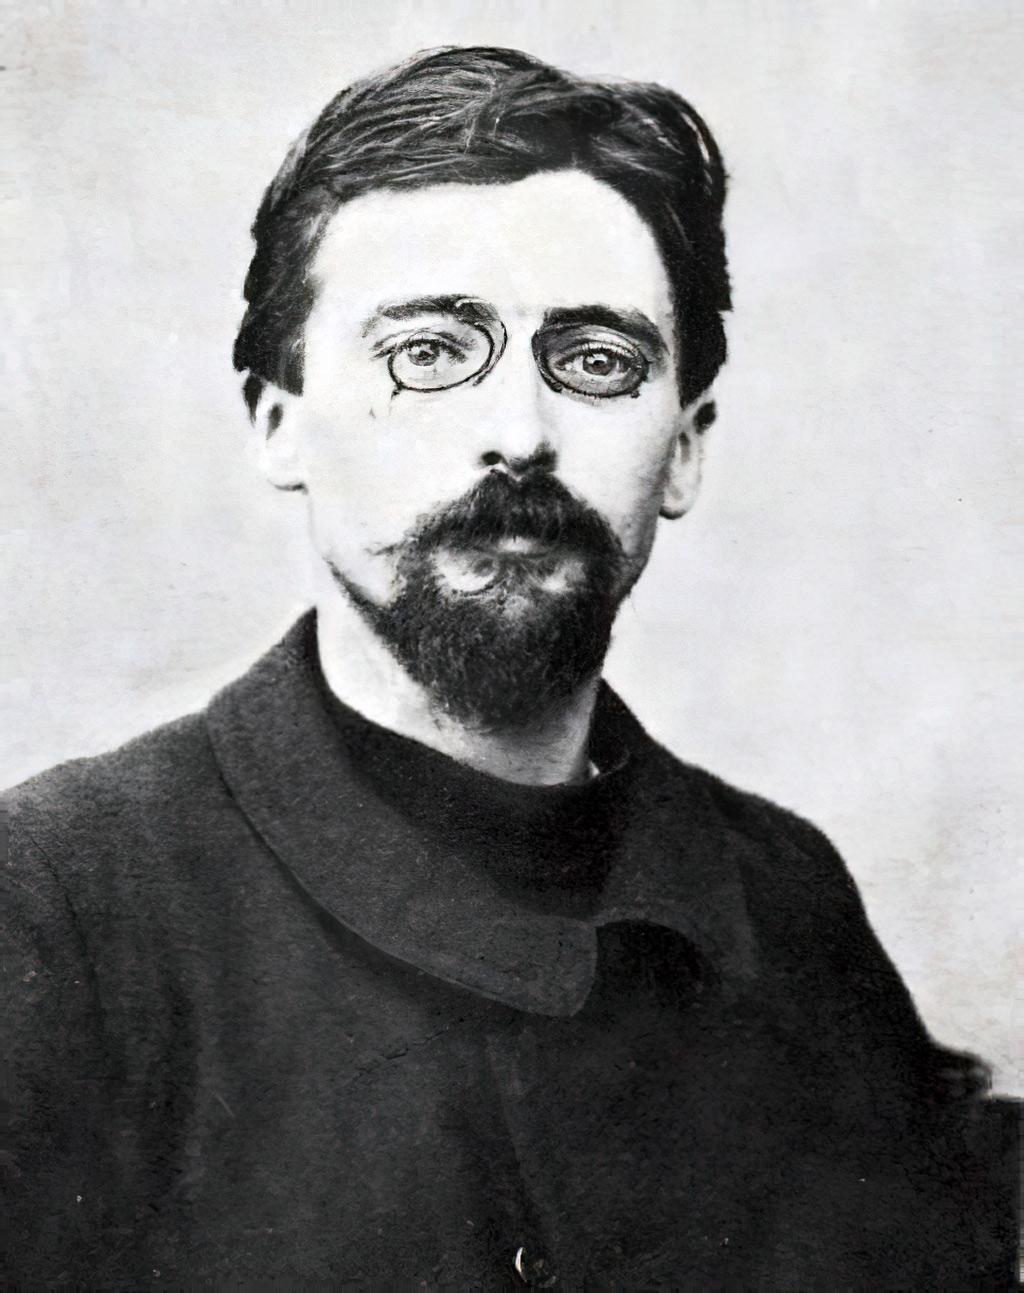 Artist: Loiseau, Gustave